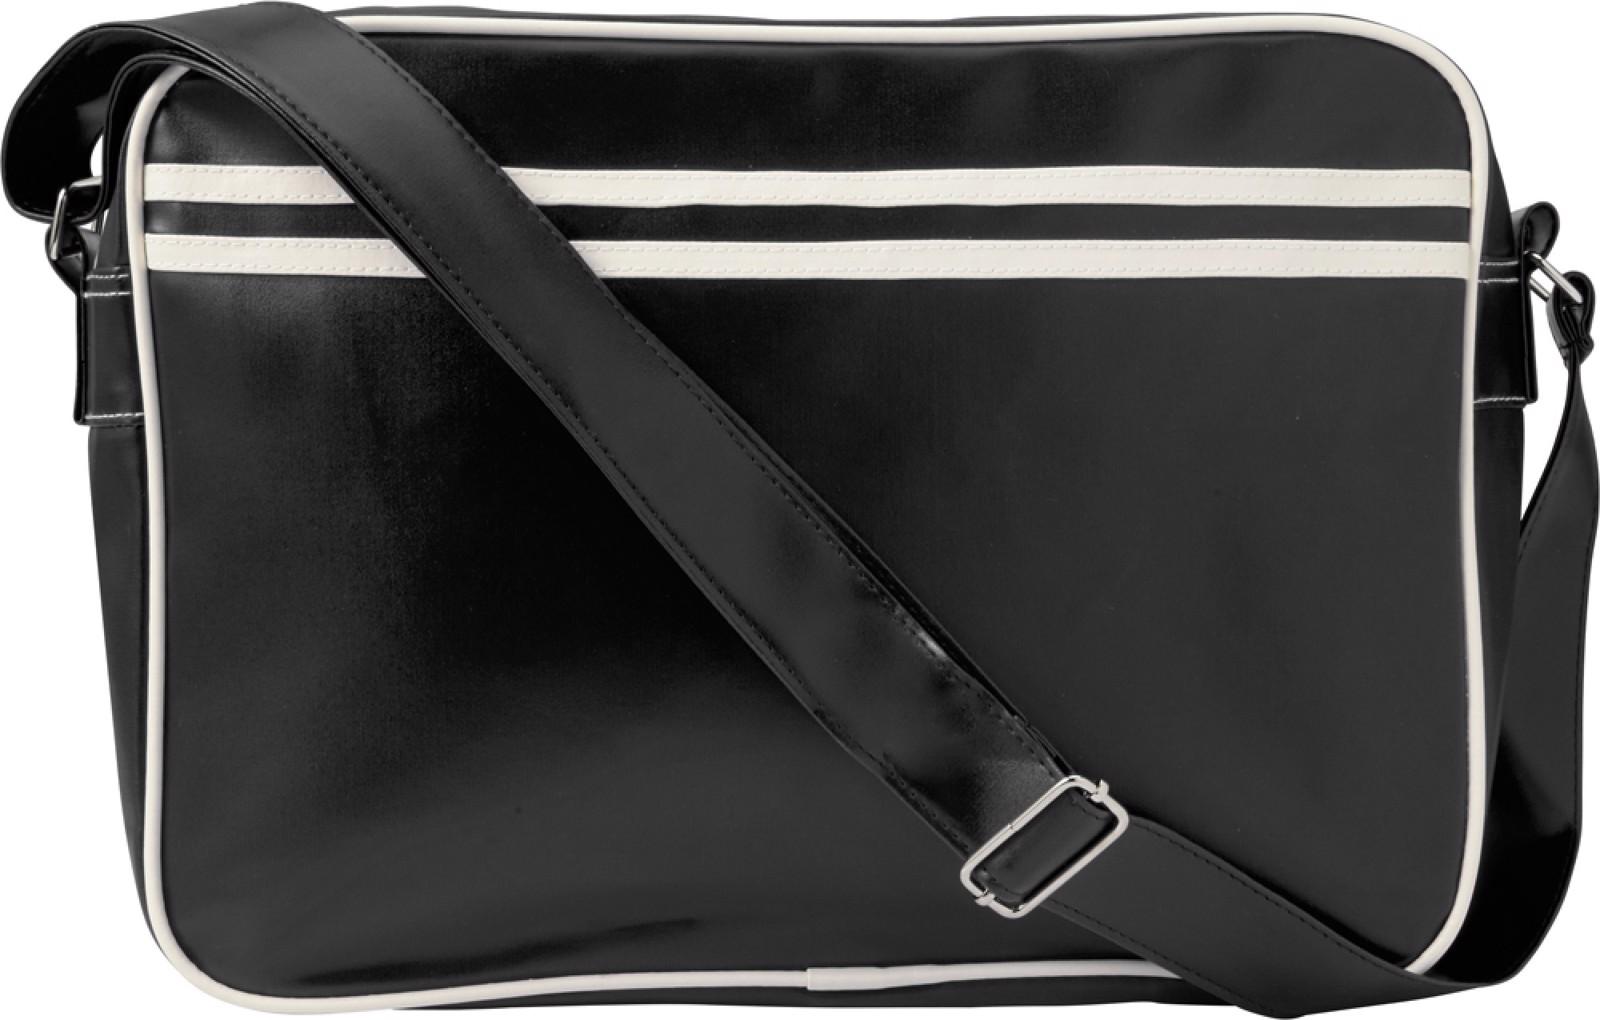 PVC messenger bag - Black